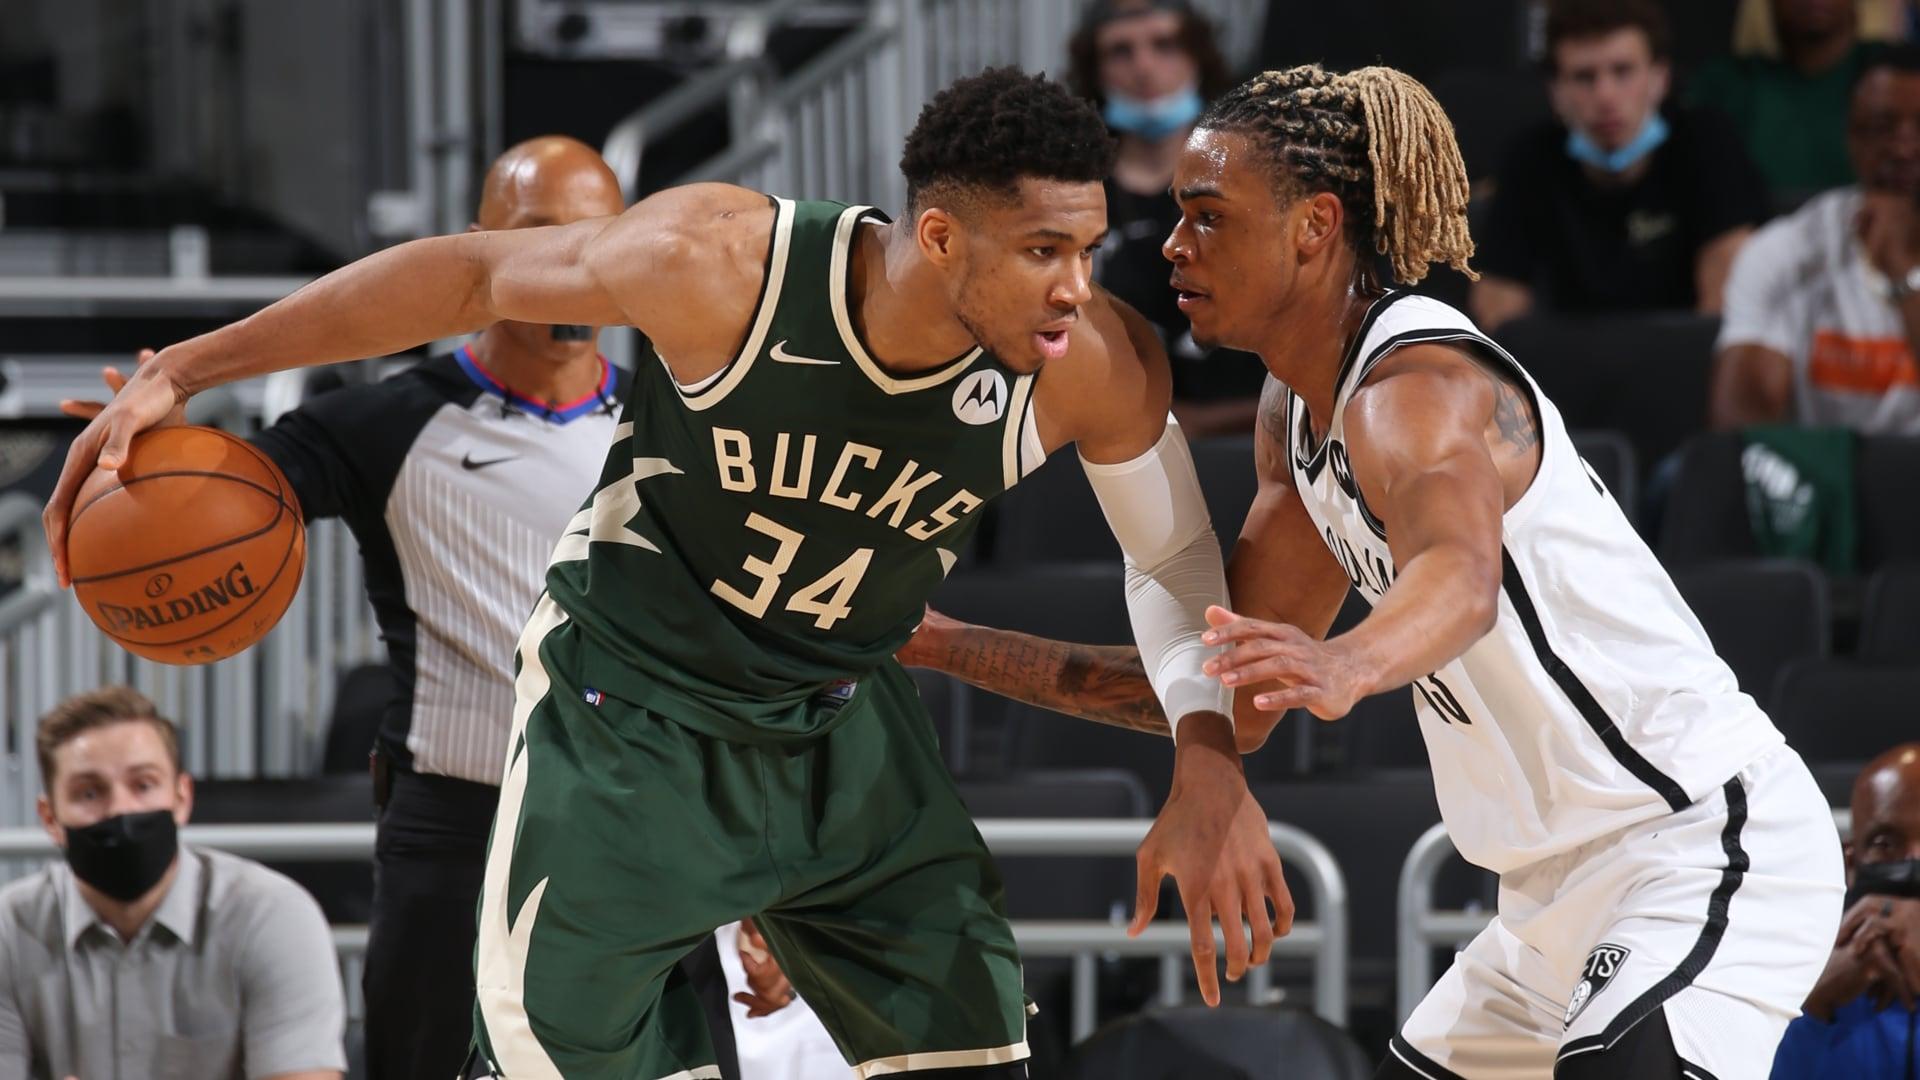 Game 3 Recap: Bucks 86, Nets 83